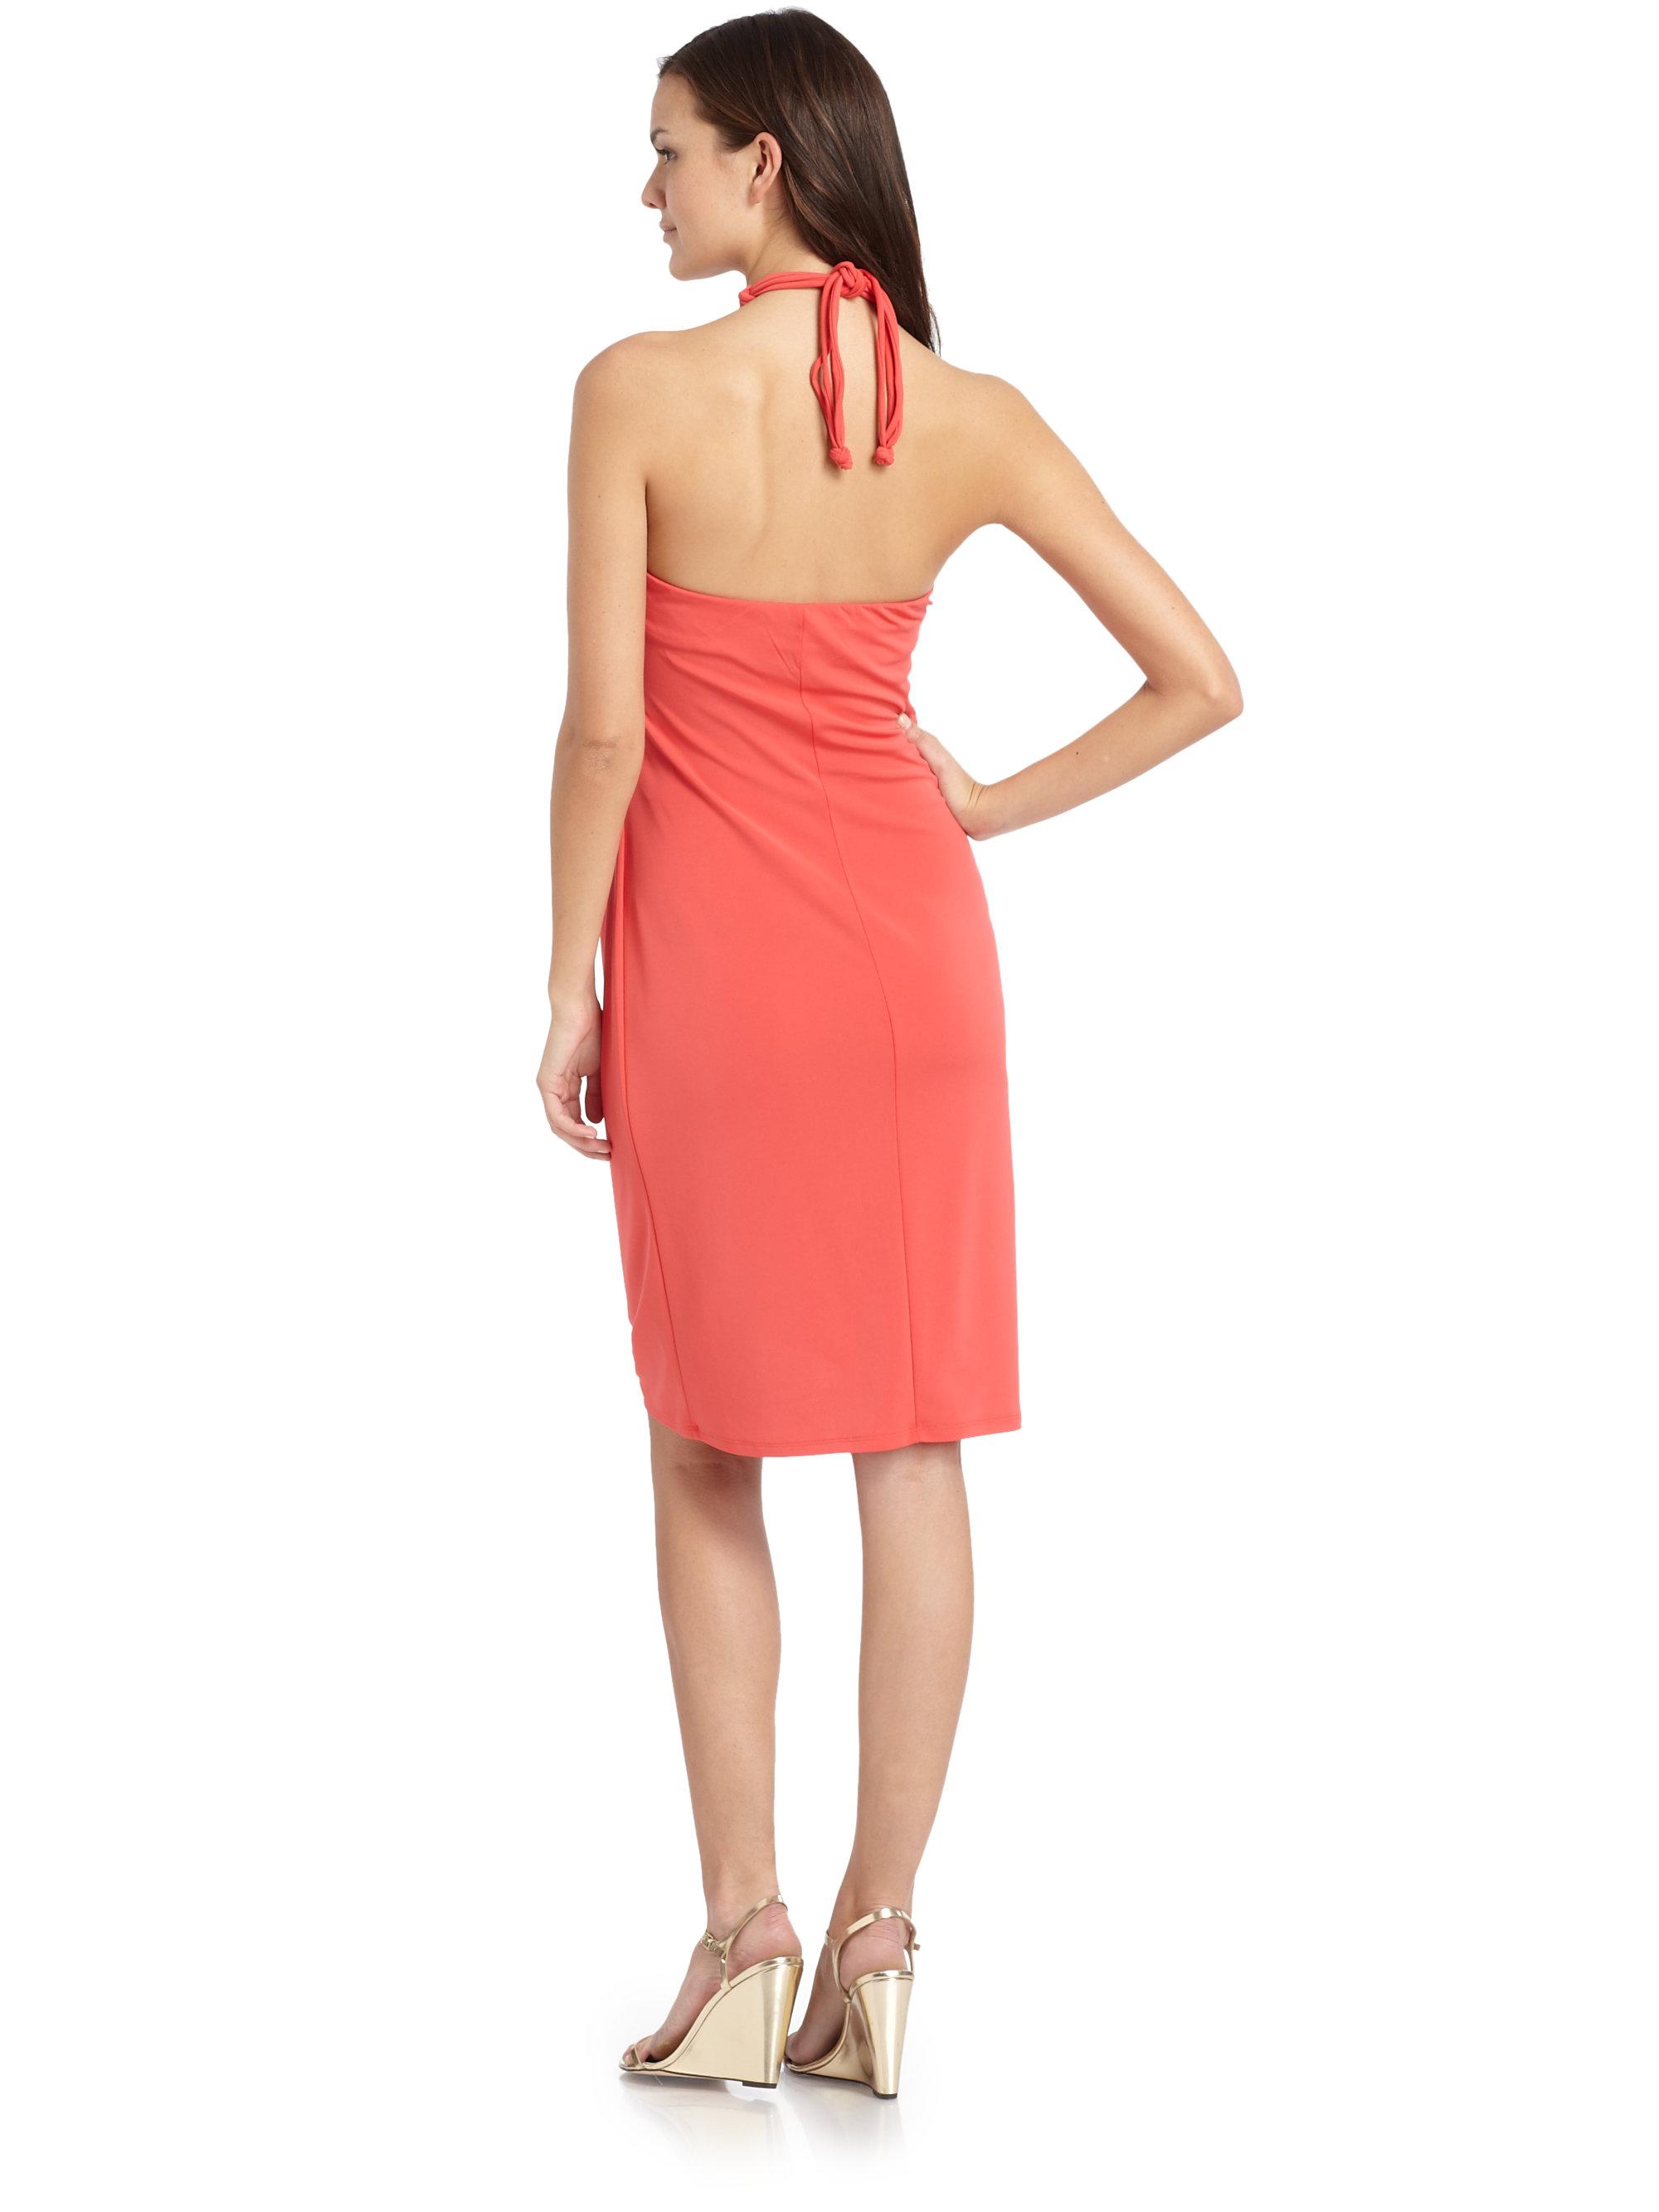 Josie natori matte jersey necklace halter dress in orange for Jewelry to wear with coral dress